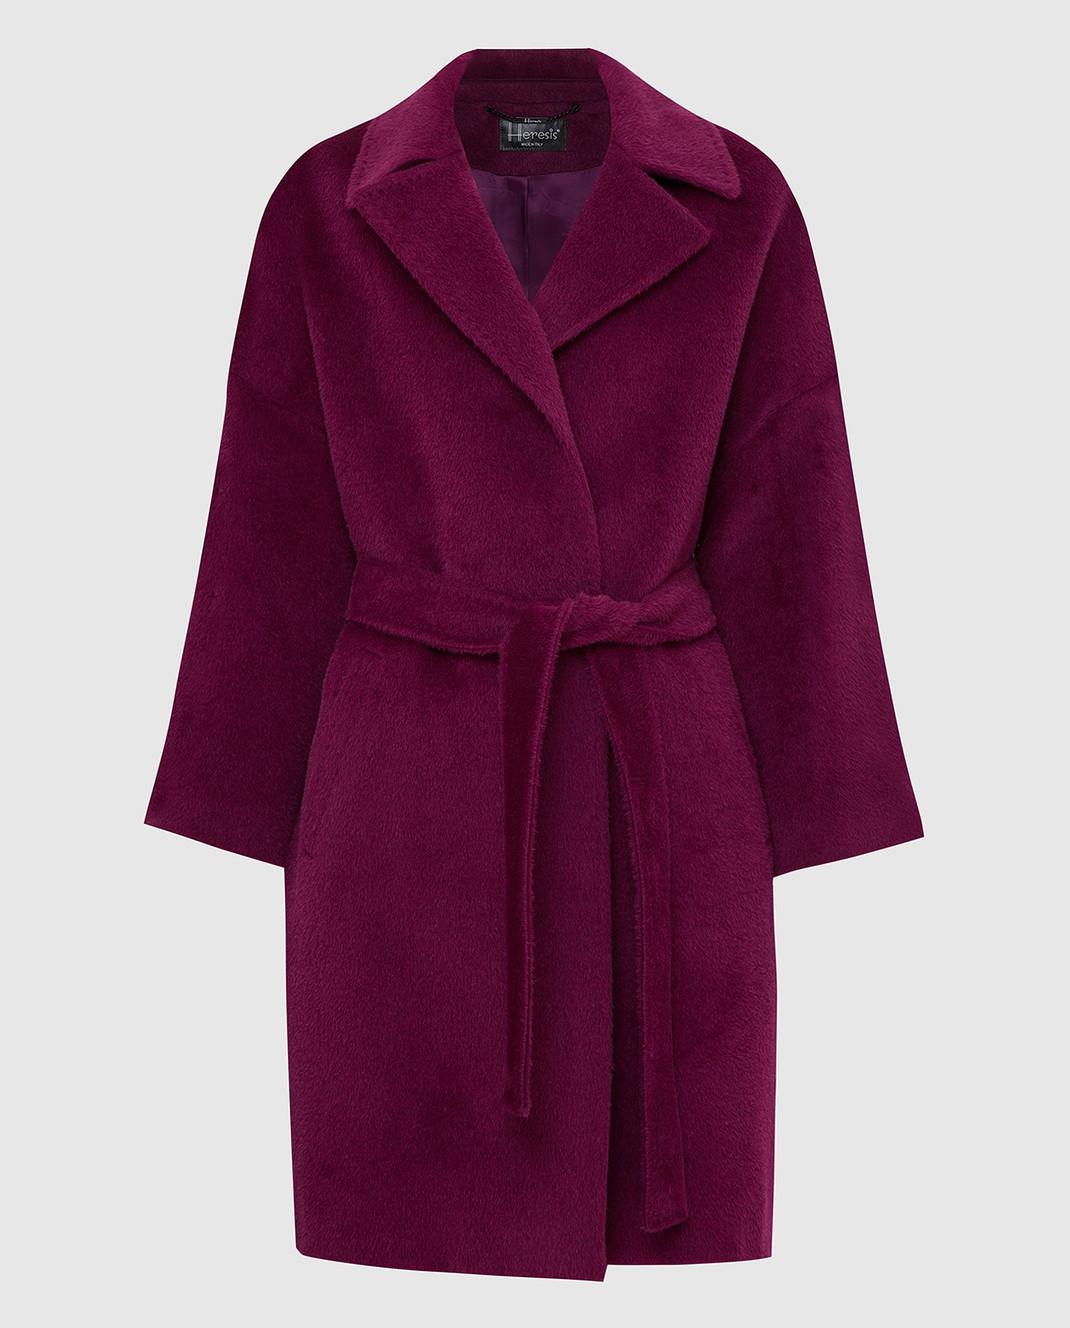 Heresis Светло-фиолетовое пальто из ламы и шерсти K8095